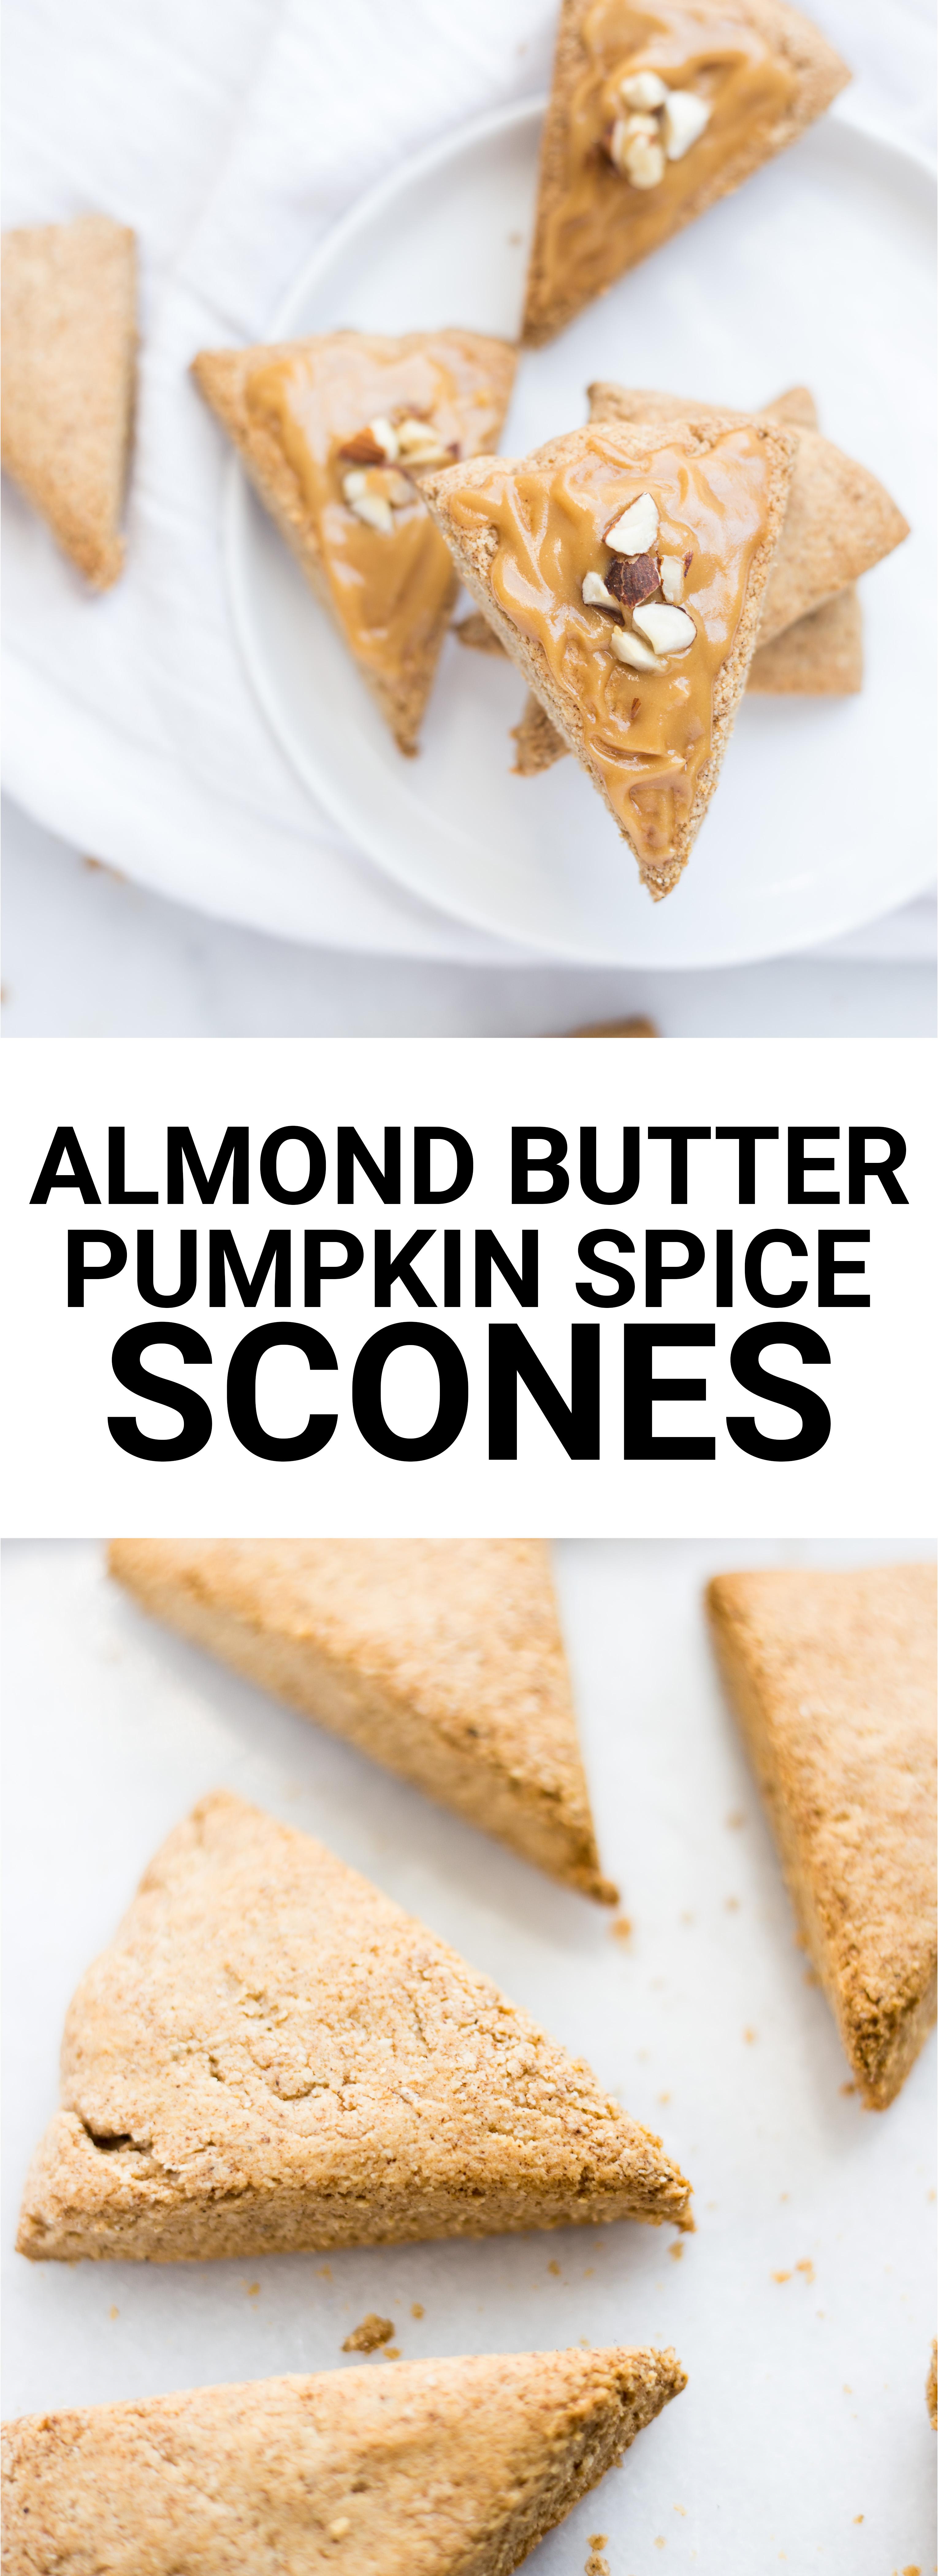 Mini Almond Butter Pumpkin Spice Scones - Fooduzzi